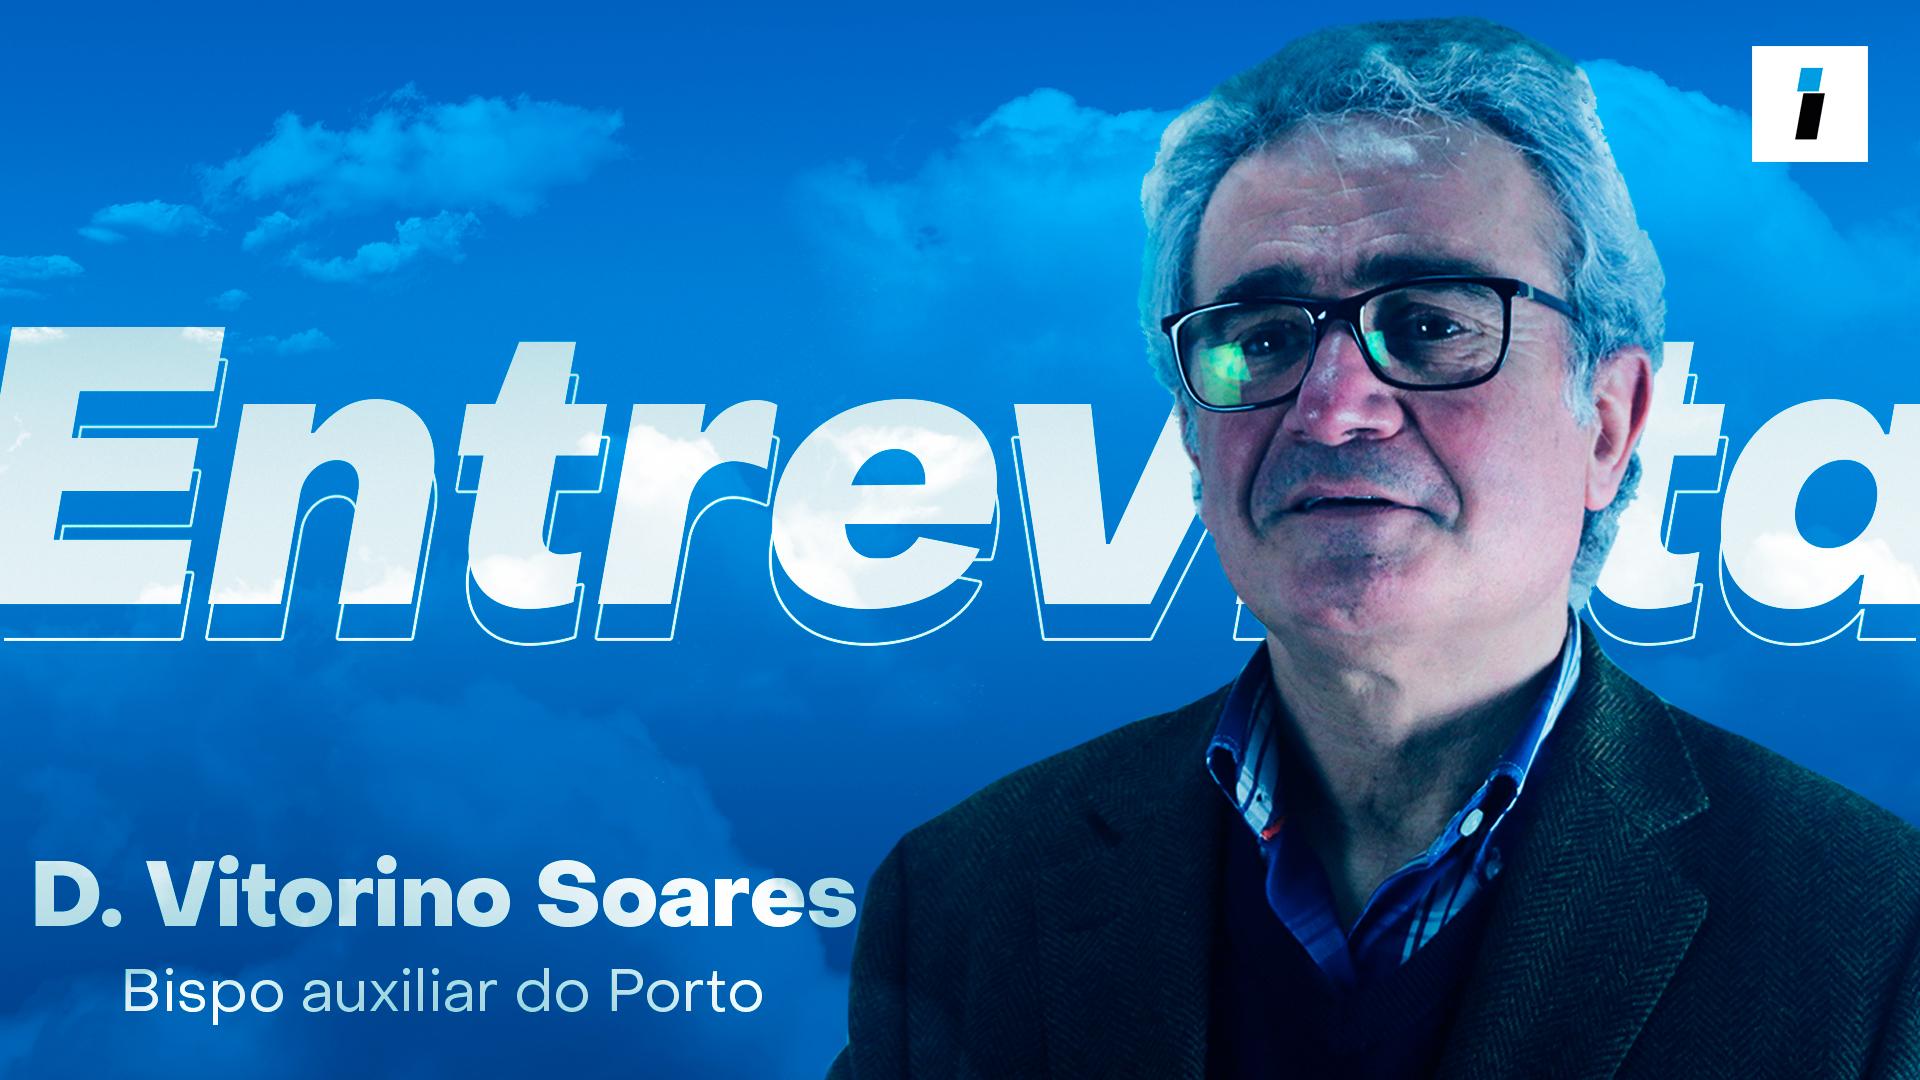 D. Vitorino Soares